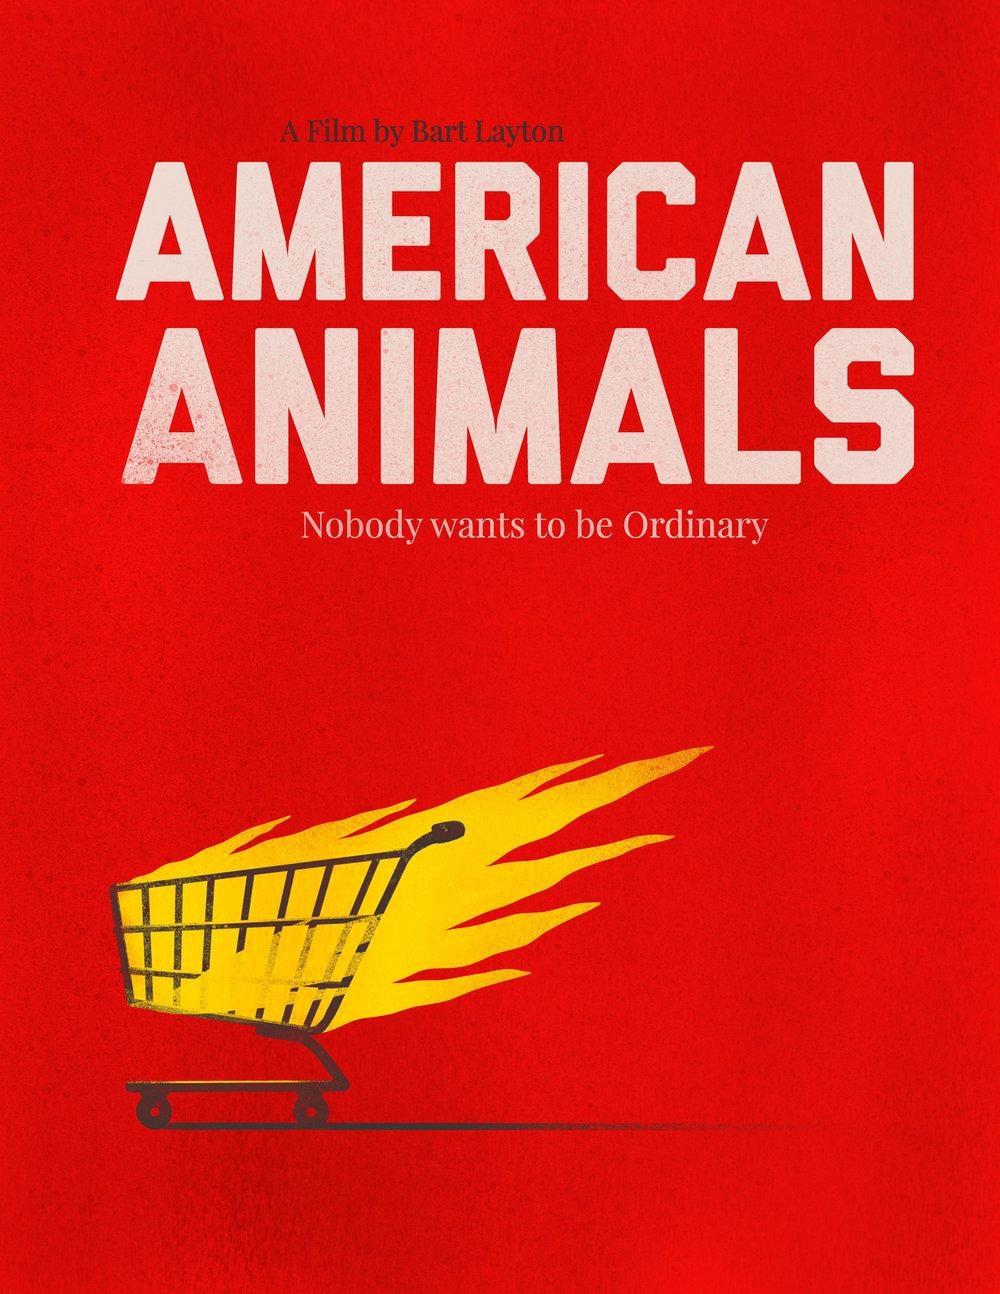 American Animals.